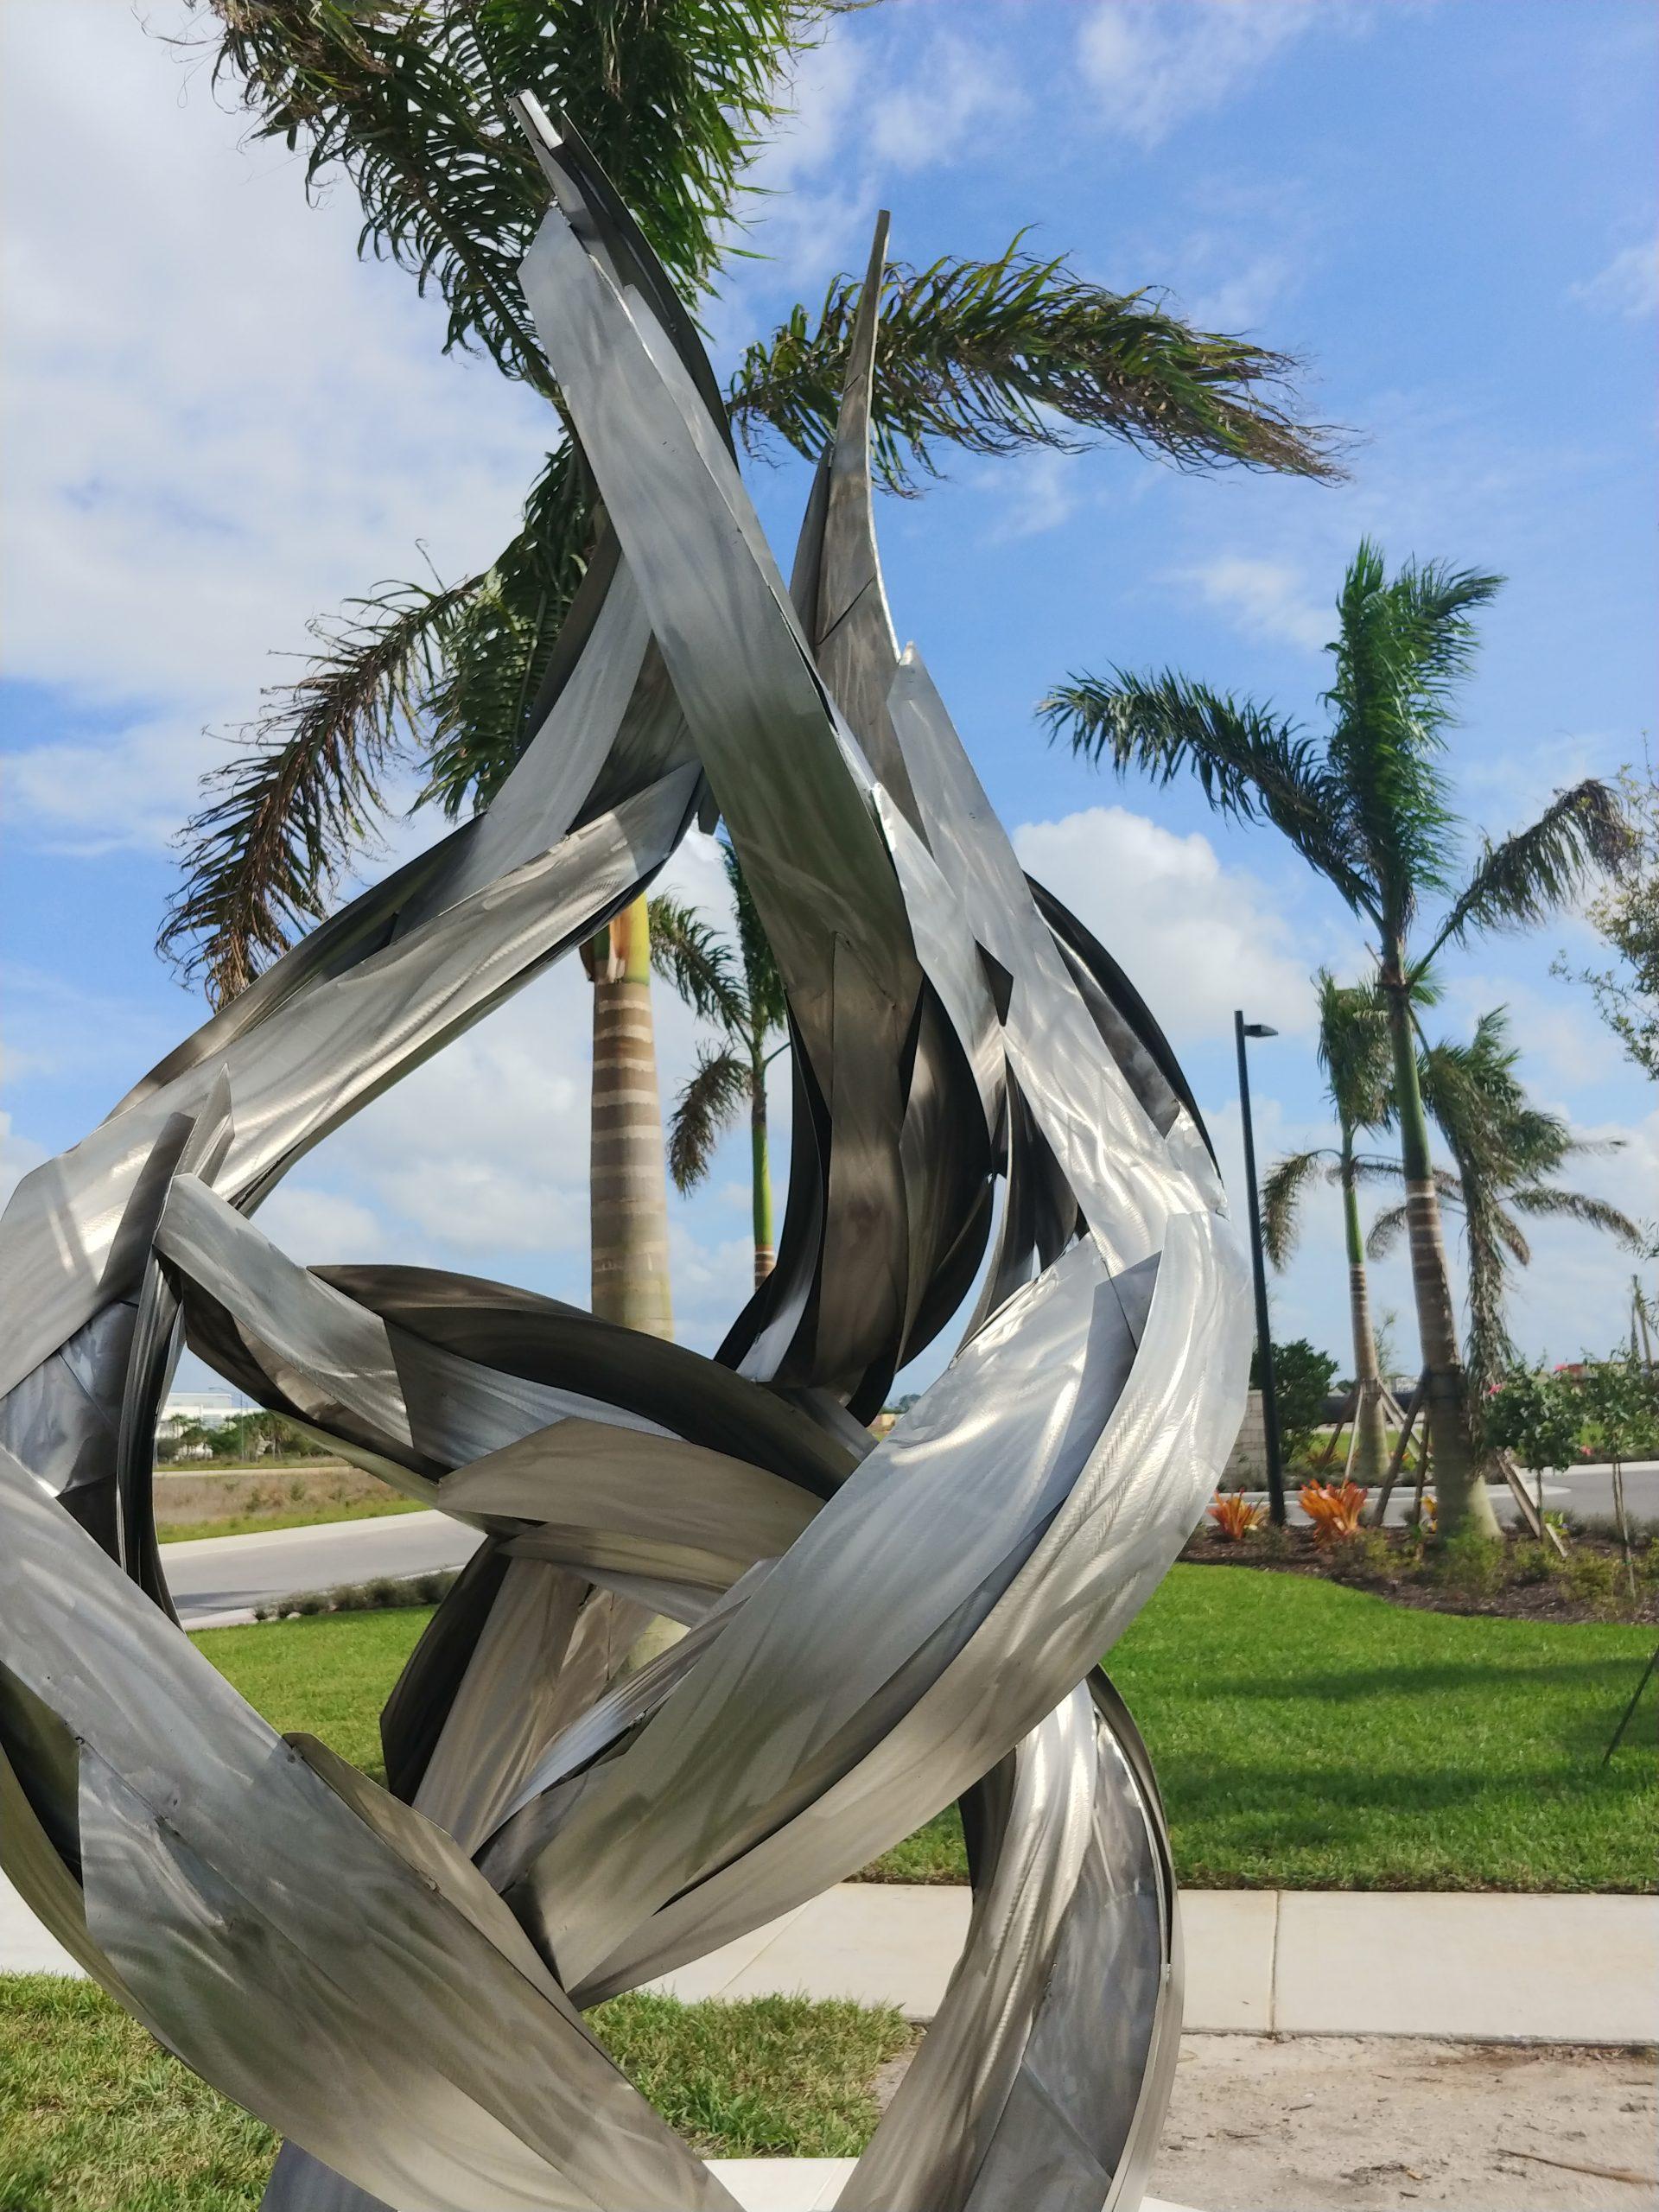 Evolve Stainless Steel Sculpture